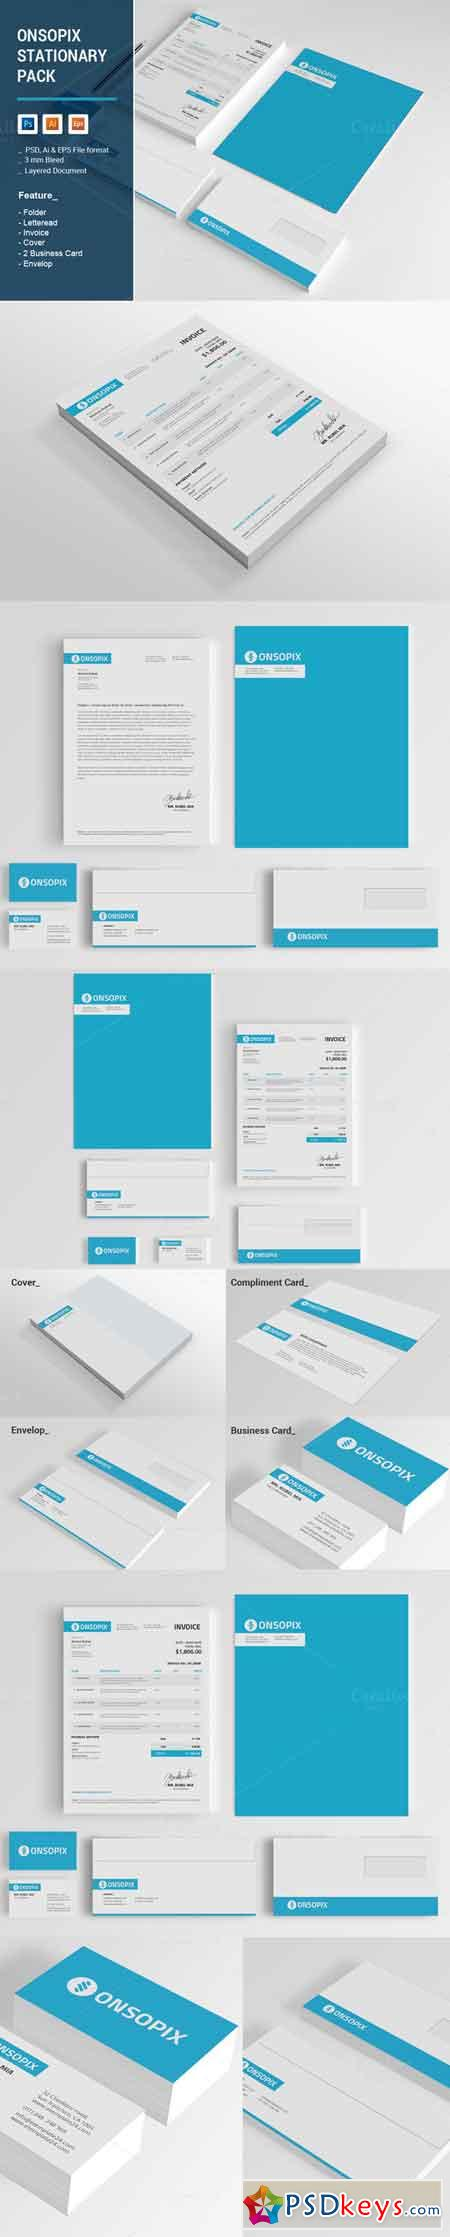 Onsopix Stationary Pack 672083